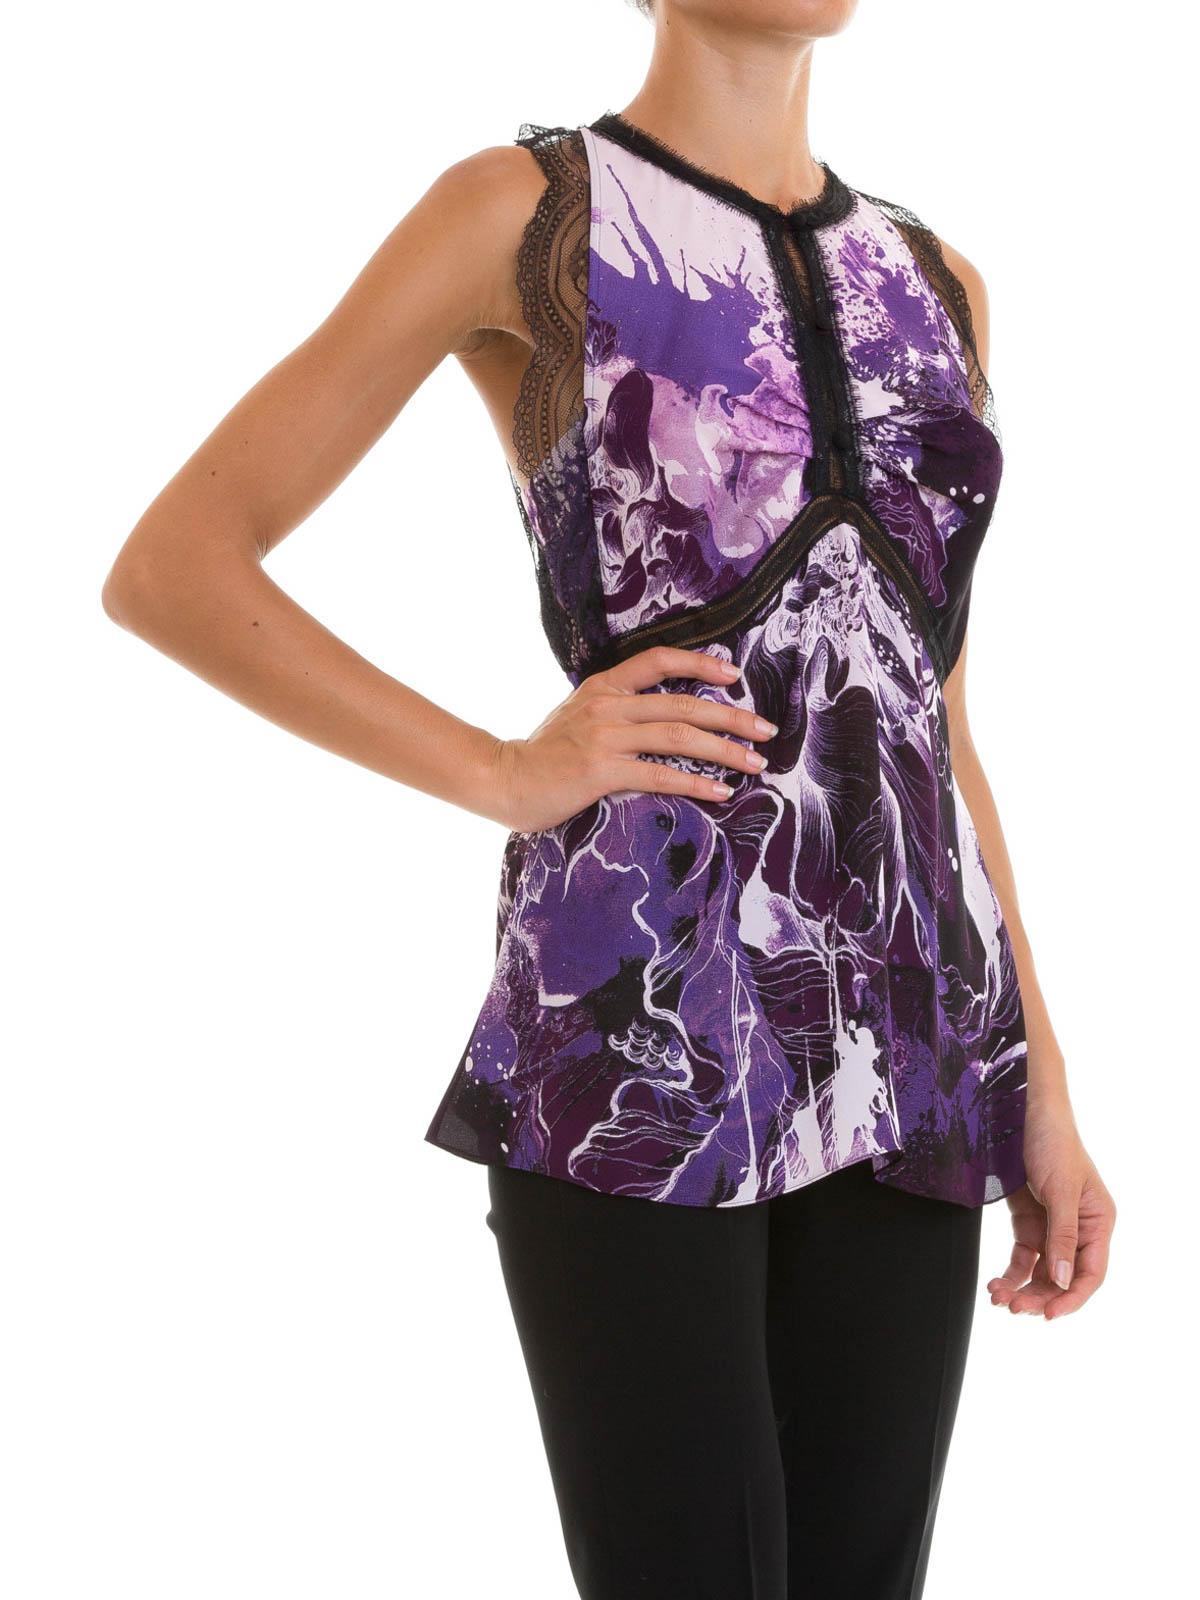 Kimono Floral printed silk top by Roberto Cavalli - Tops ...